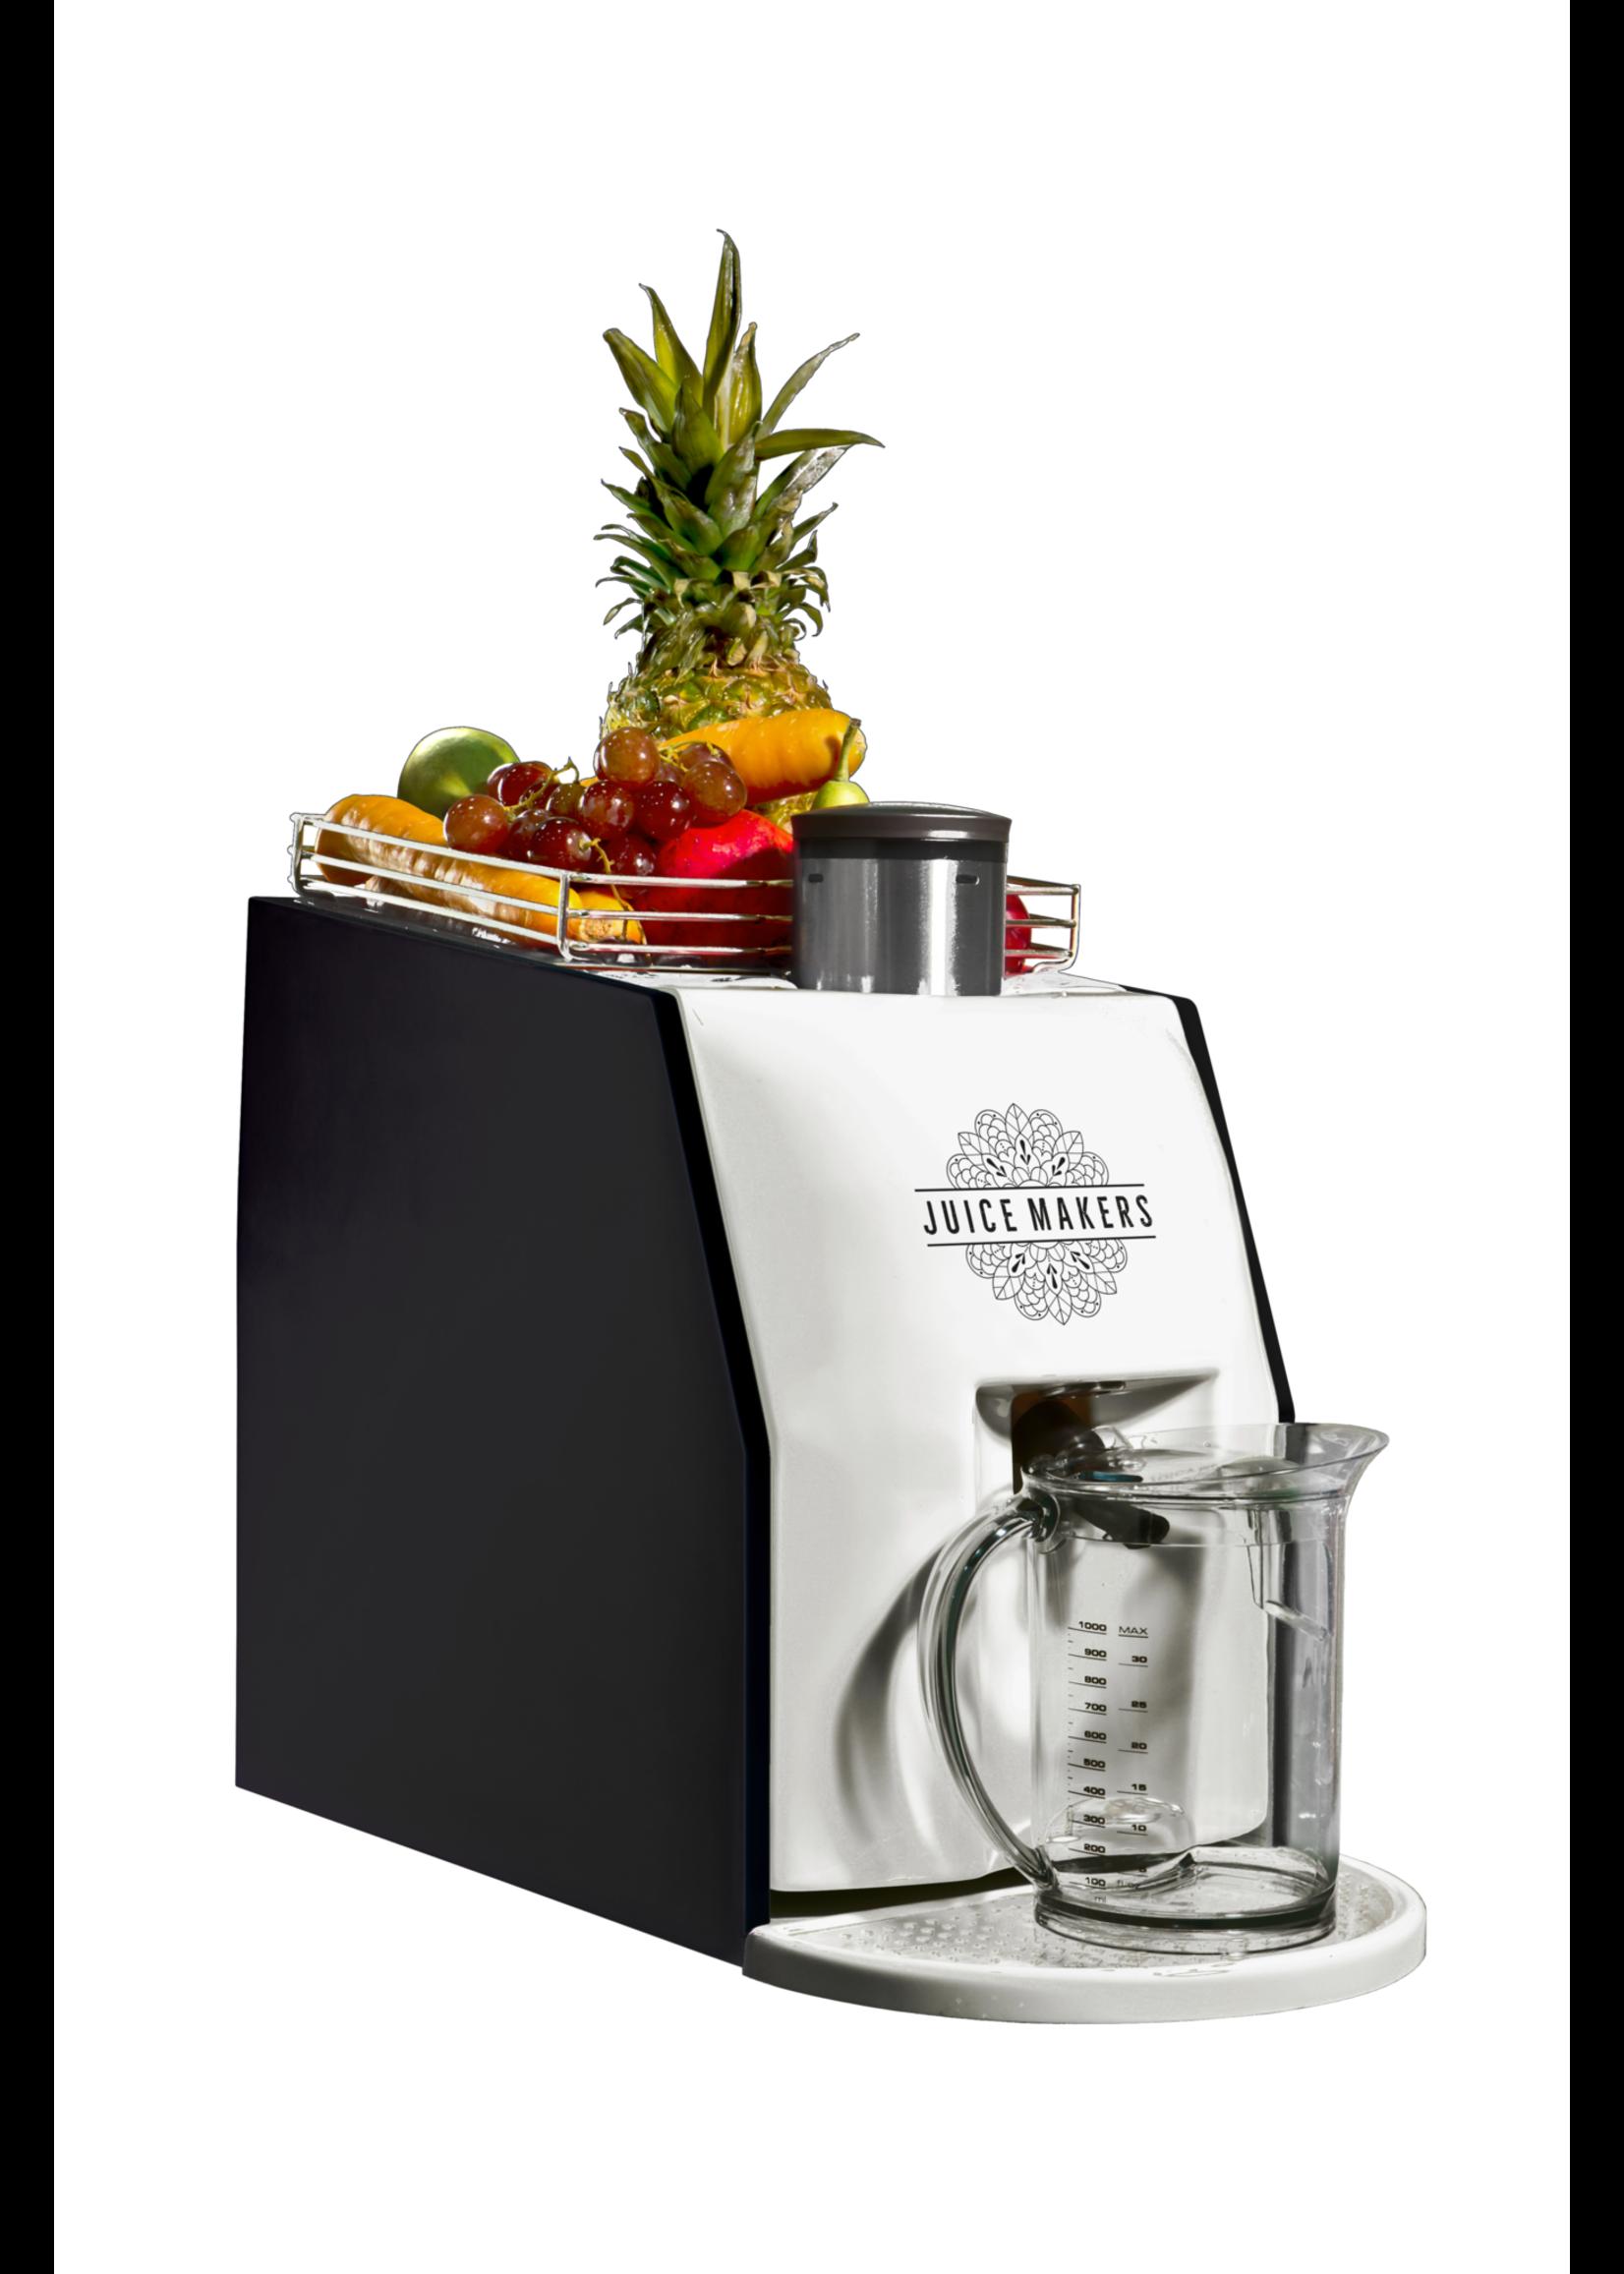 JuiceMakers Pro Sapapparaat  tafelmodel met waterrreservoir